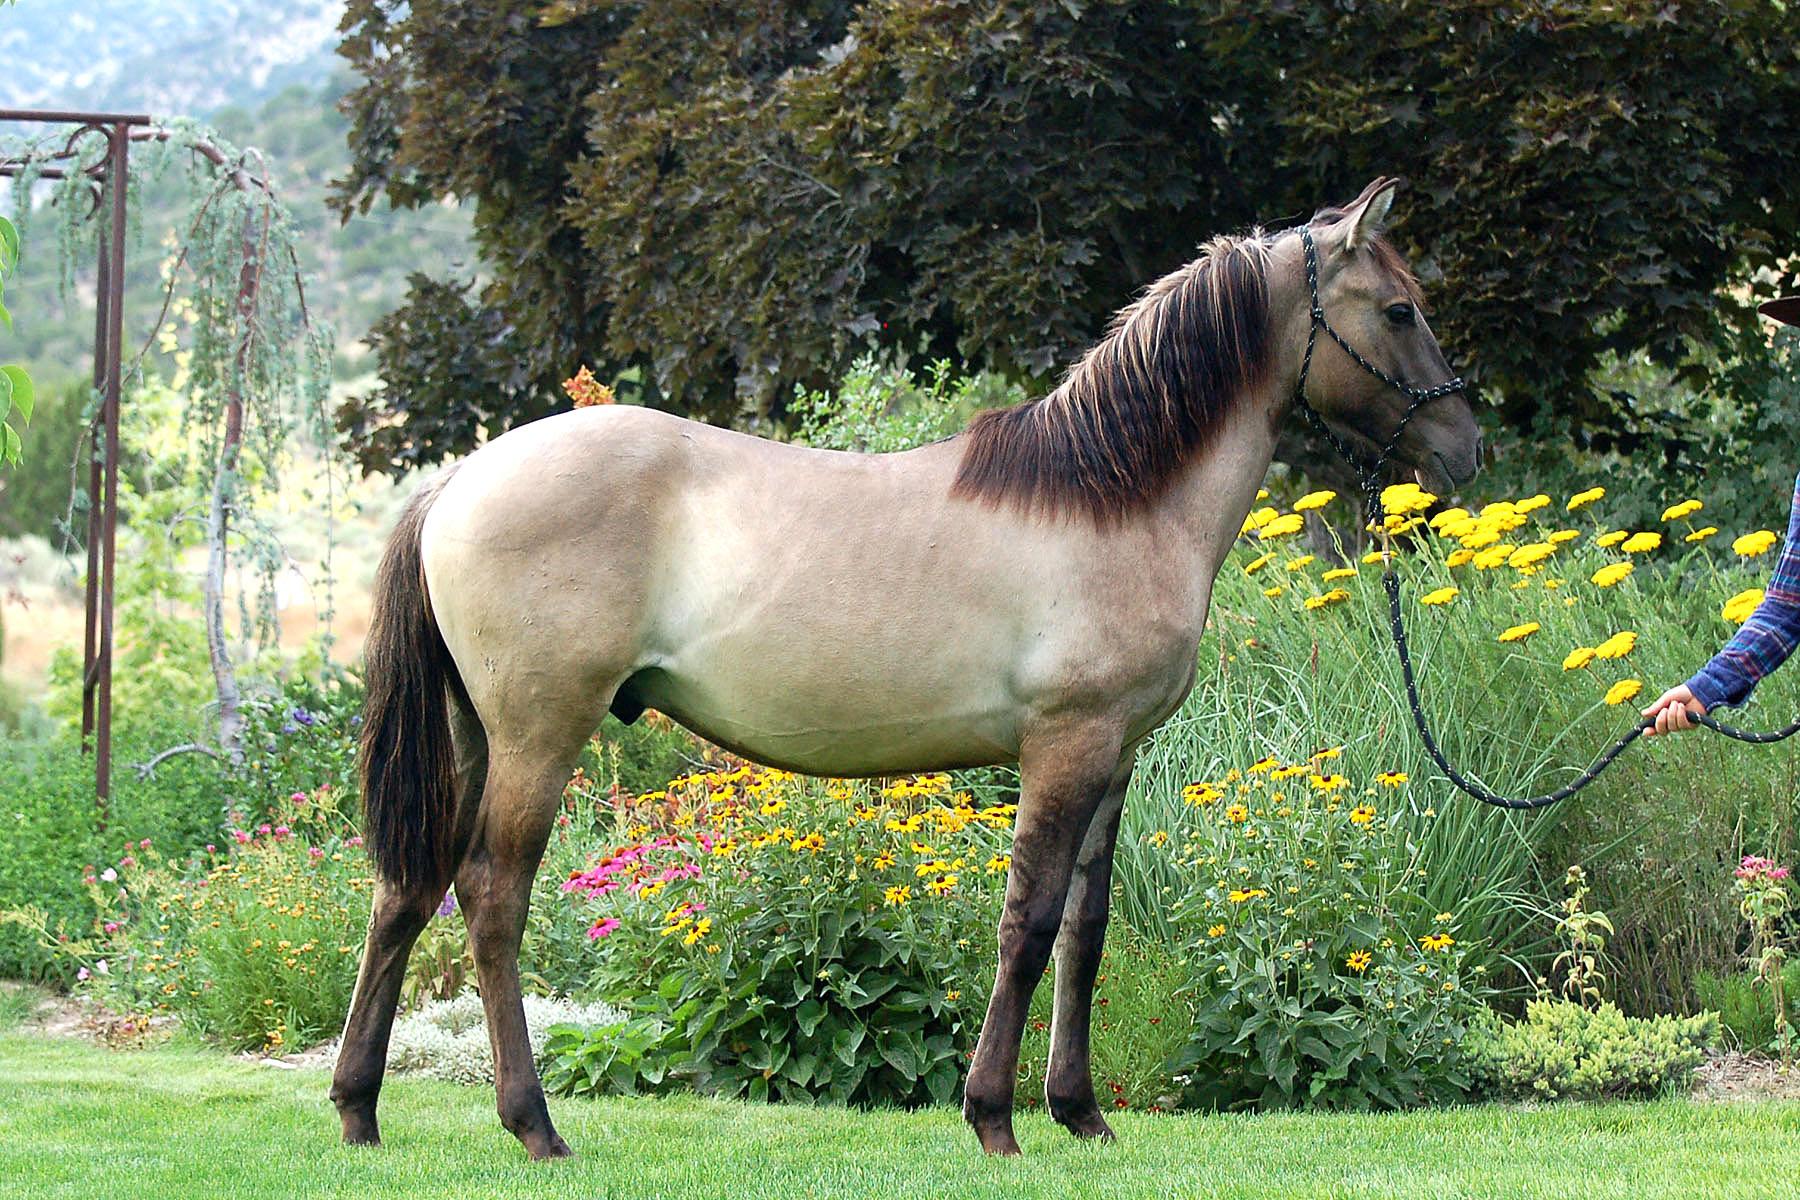 Jaz Valiant - 2018 Yearling Ameritano Stallion